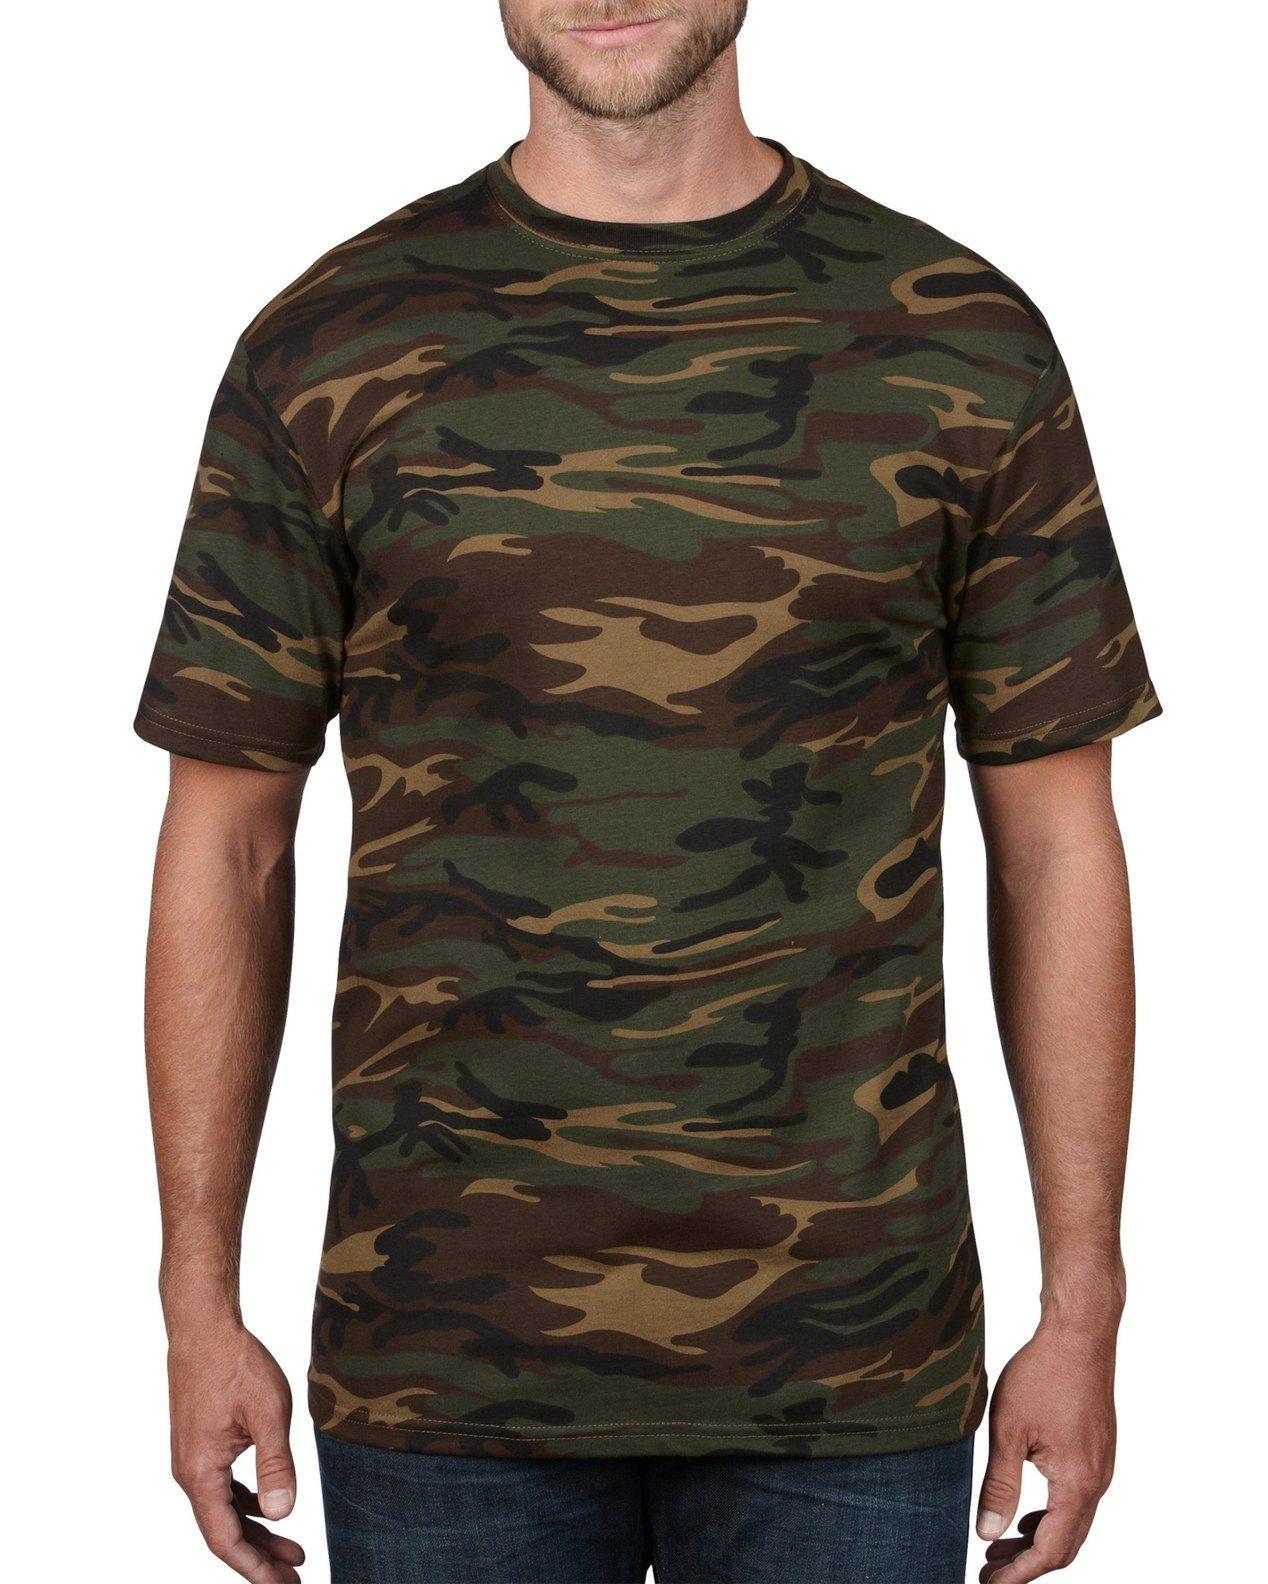 Military T Shirt Design Online